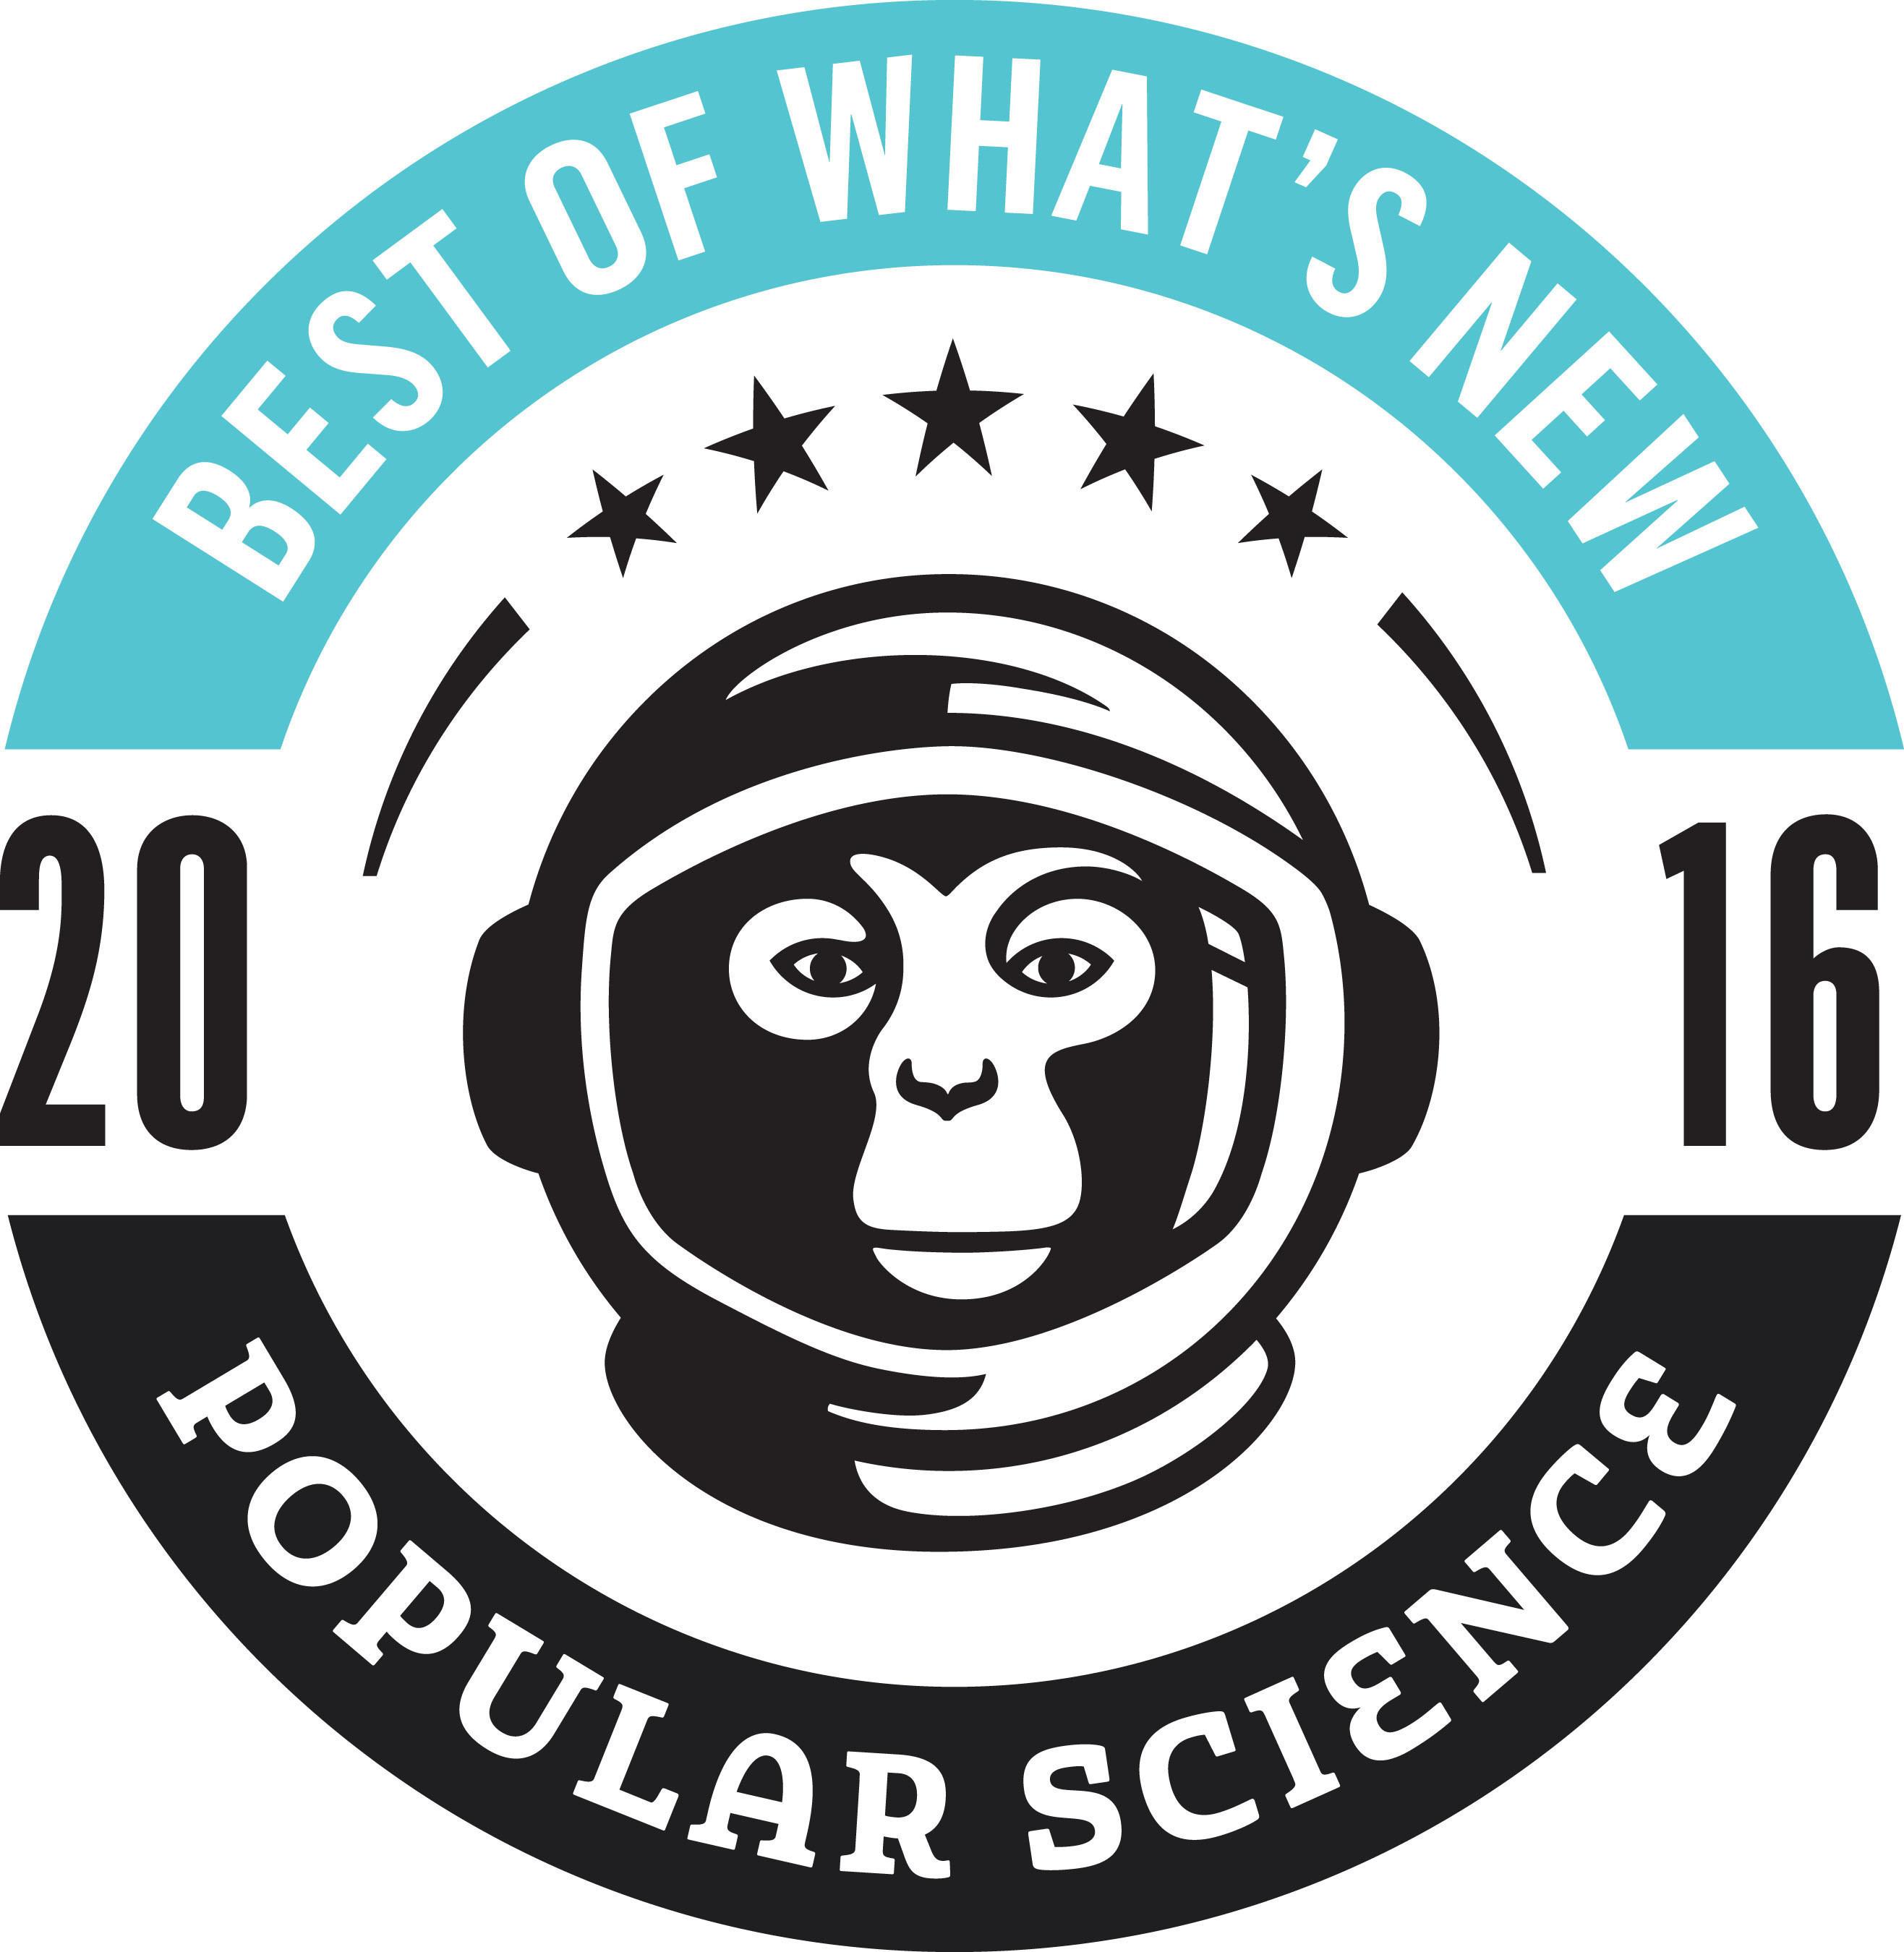 DEWALT FLEXVOLT(TM) System wins a 2016 POPULAR SCIENCE Best of What's New Award